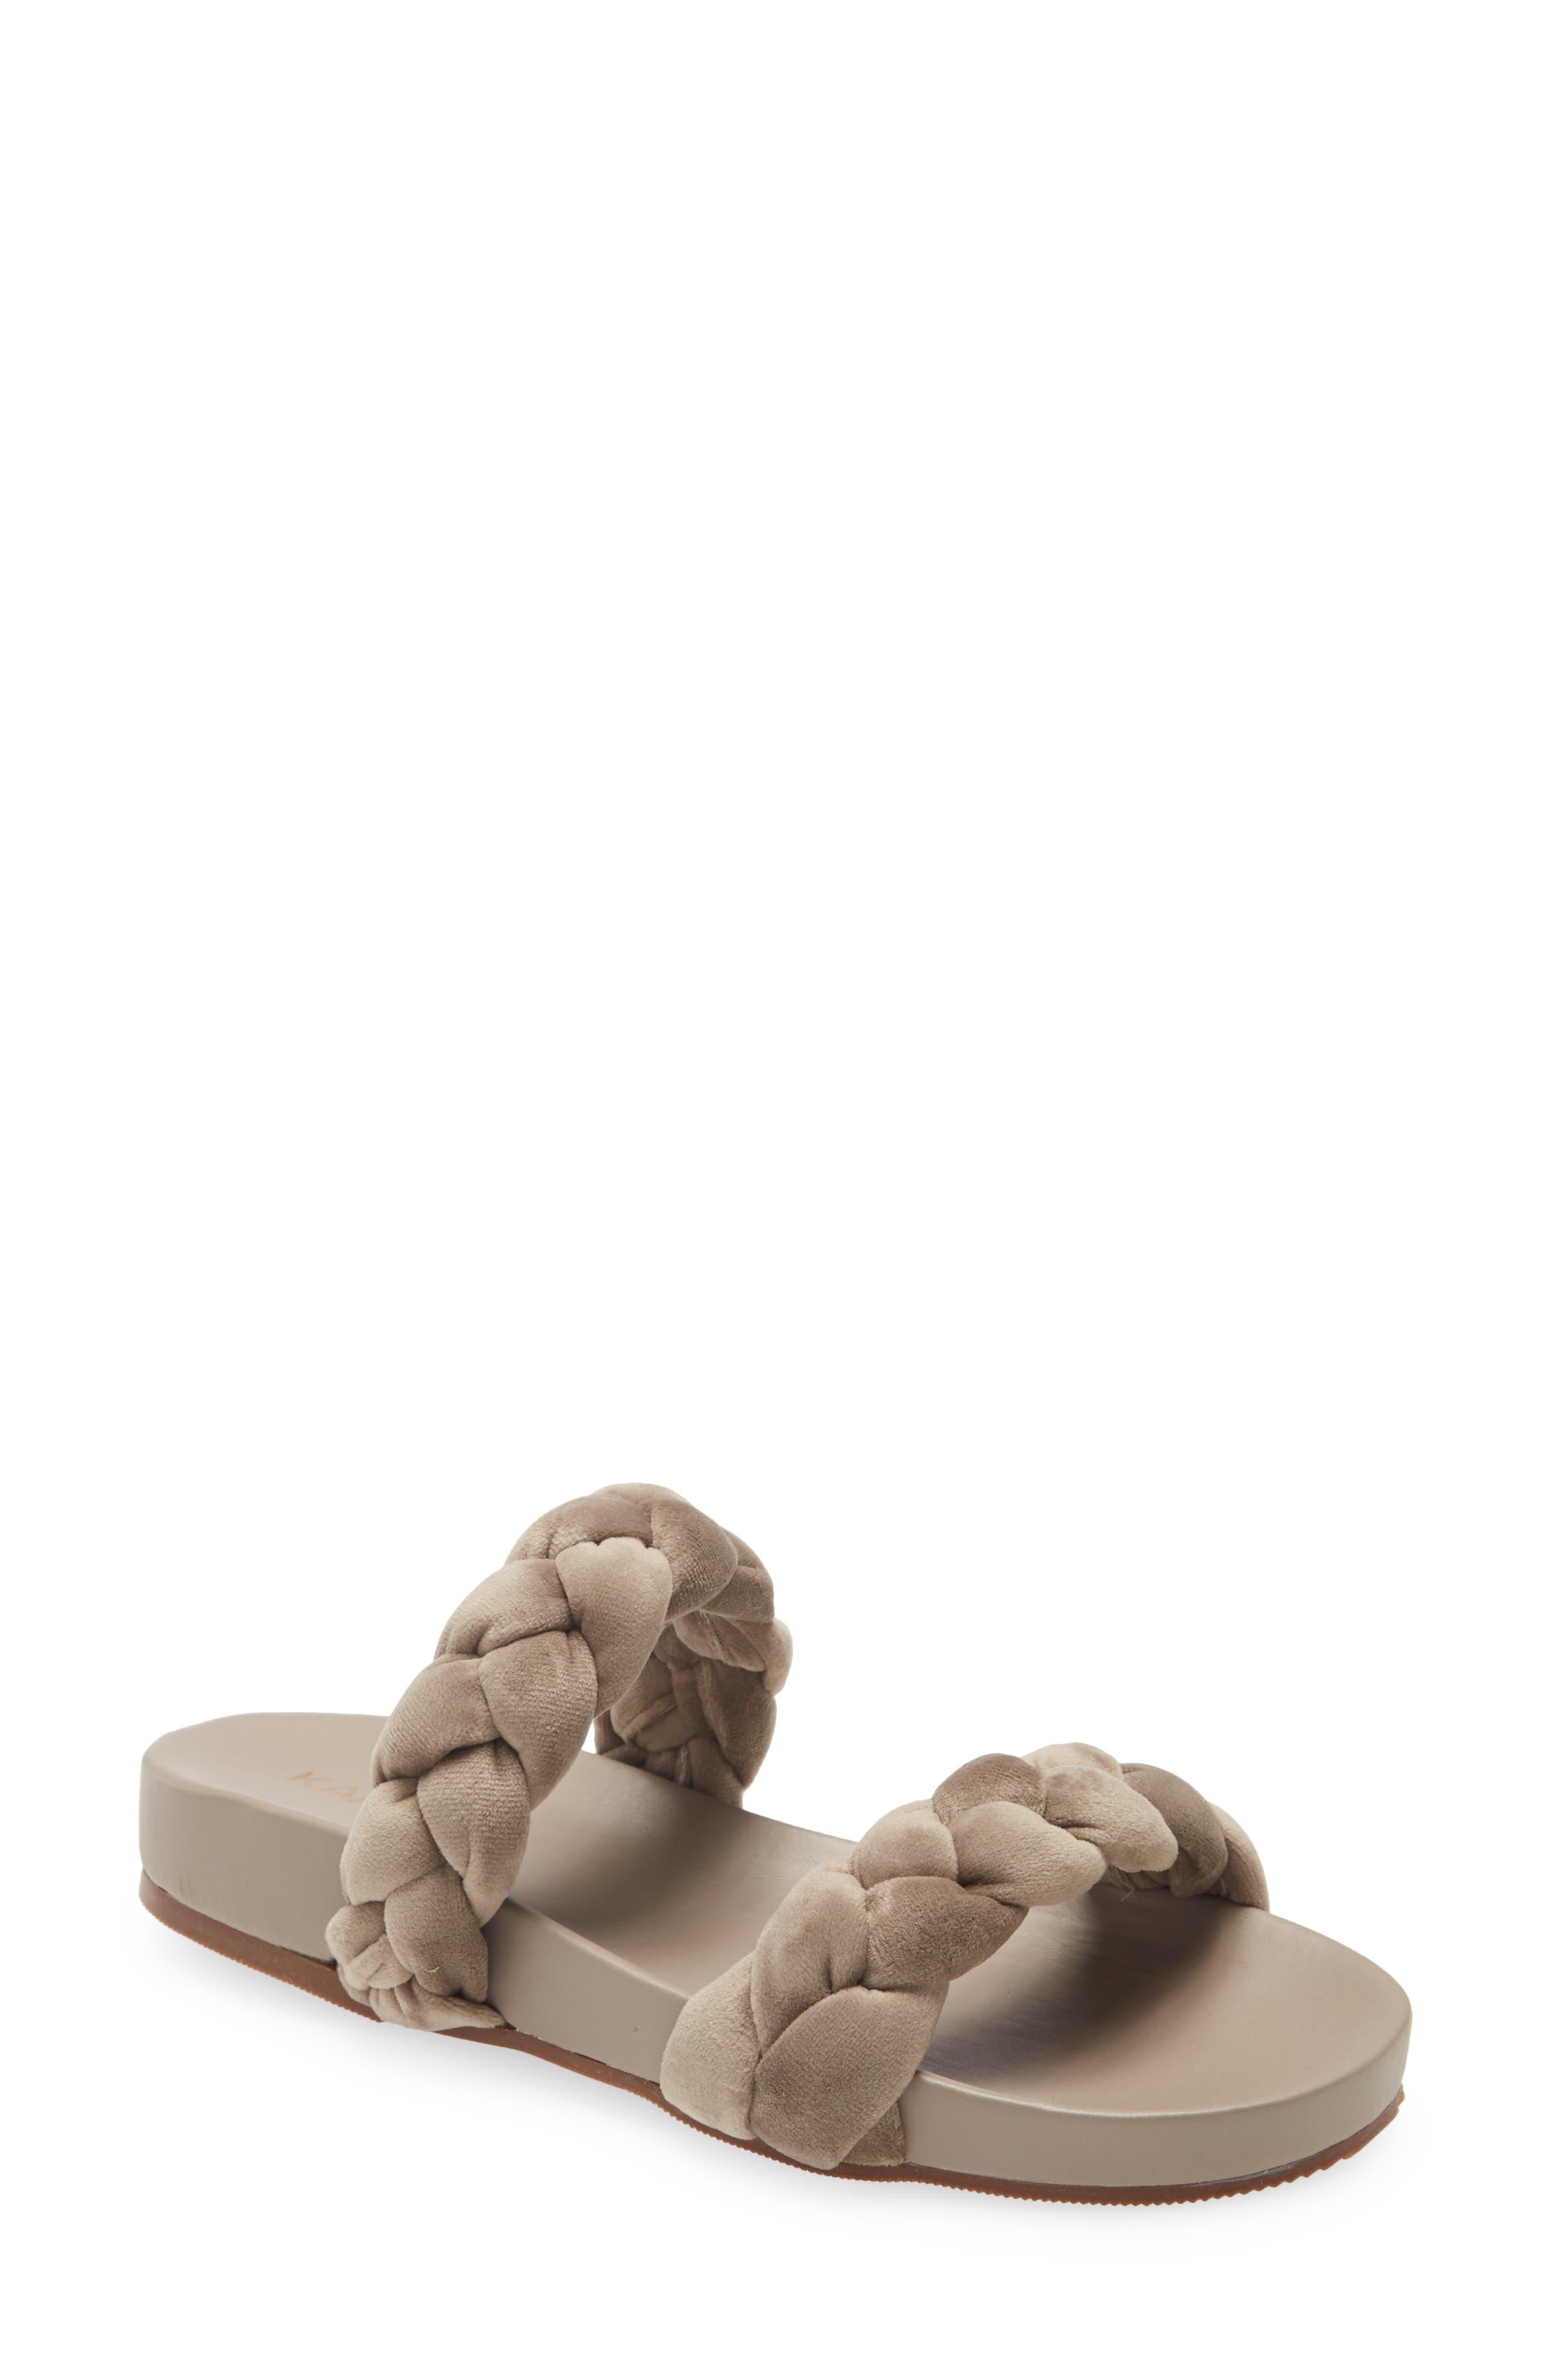 Coco Chunky Braided Pool Slide Sandal